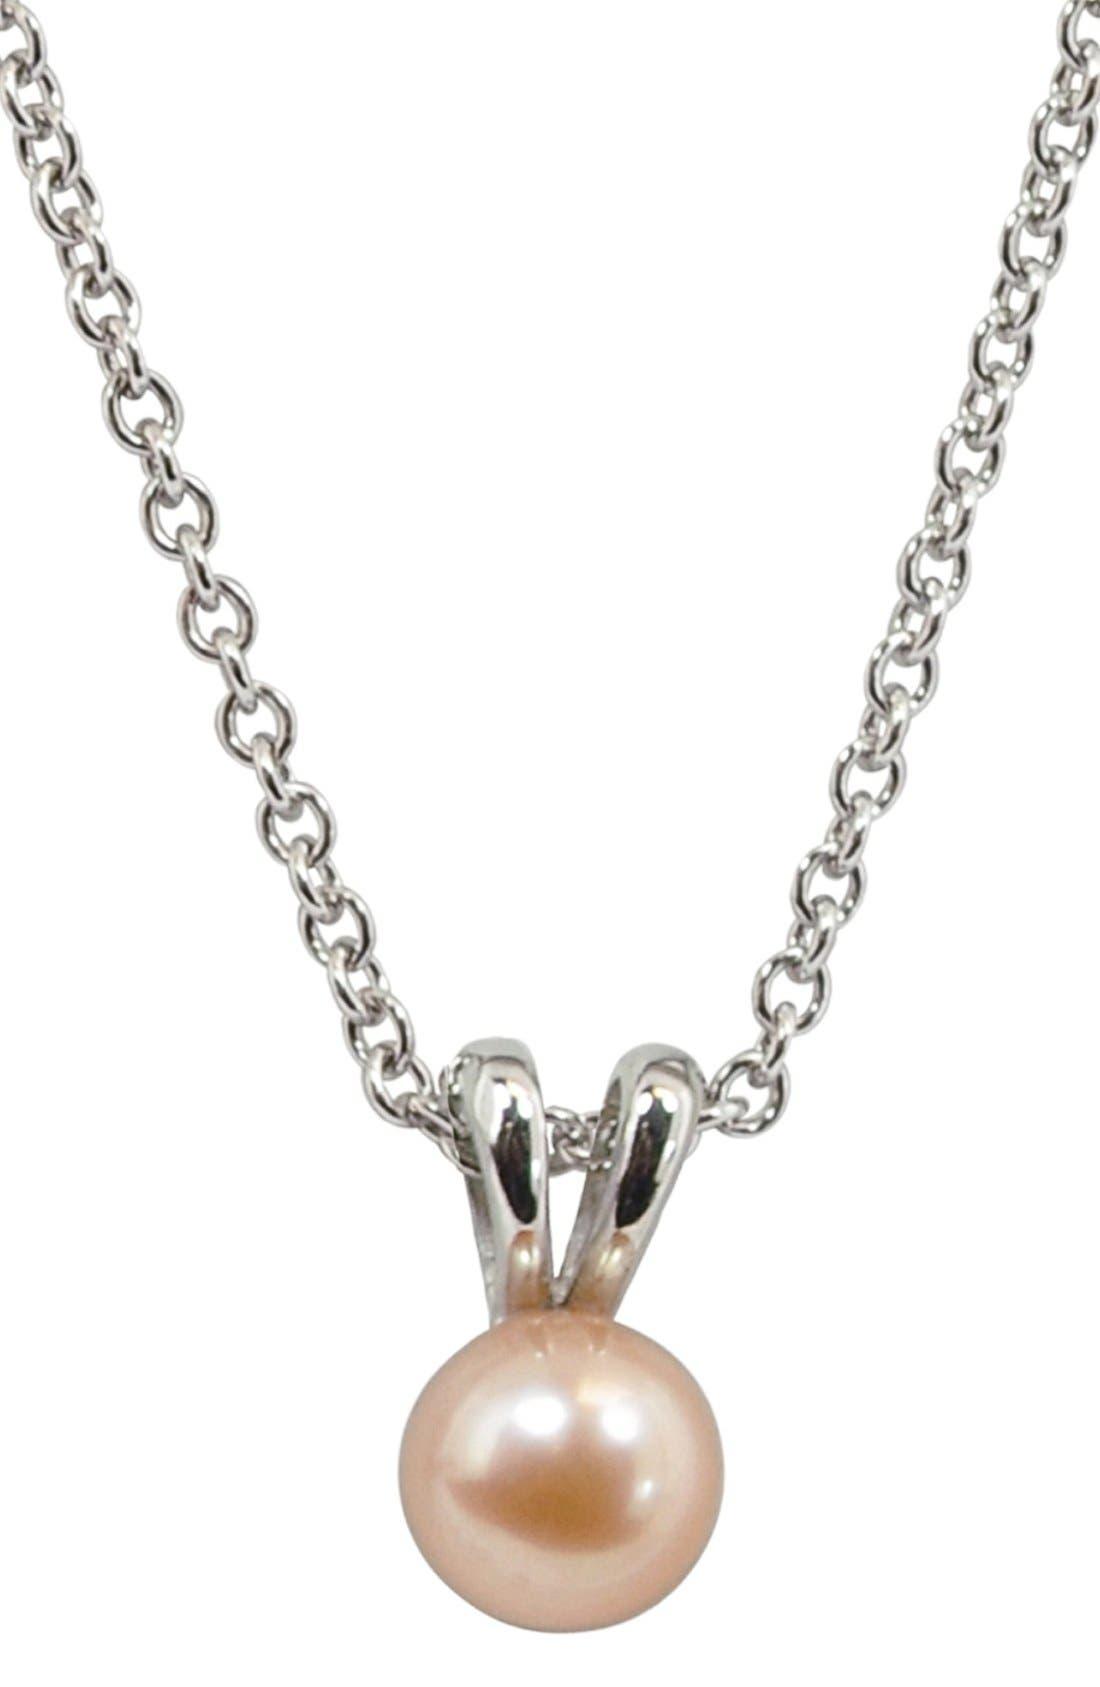 Peach Freshwater Pearl Necklace,                             Main thumbnail 1, color,                             PEACH